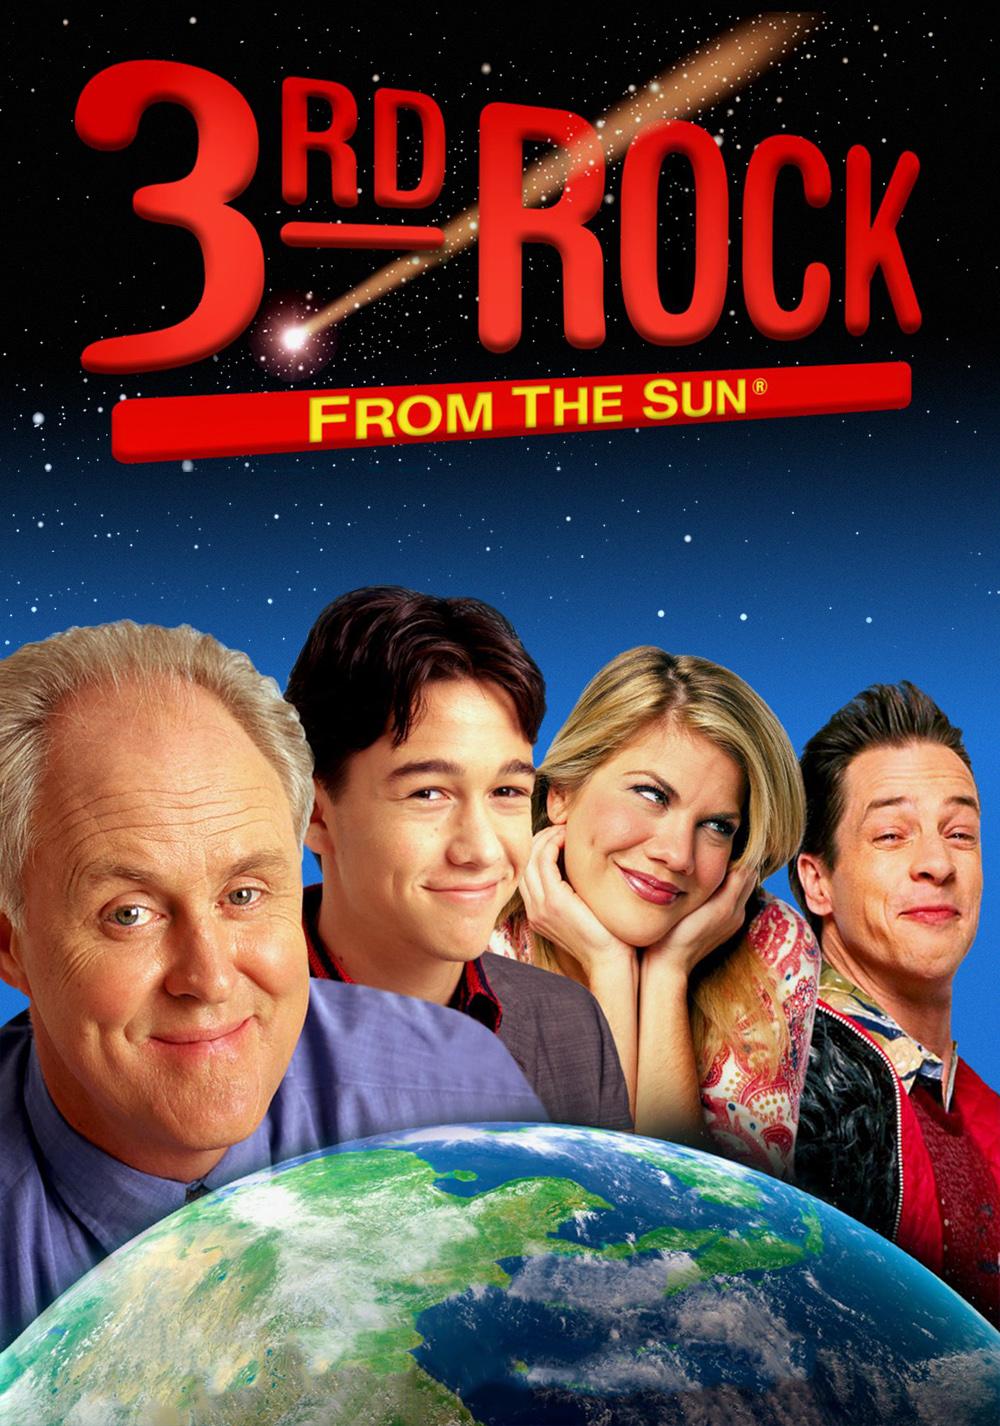 3rd Rock from the Sun kapak